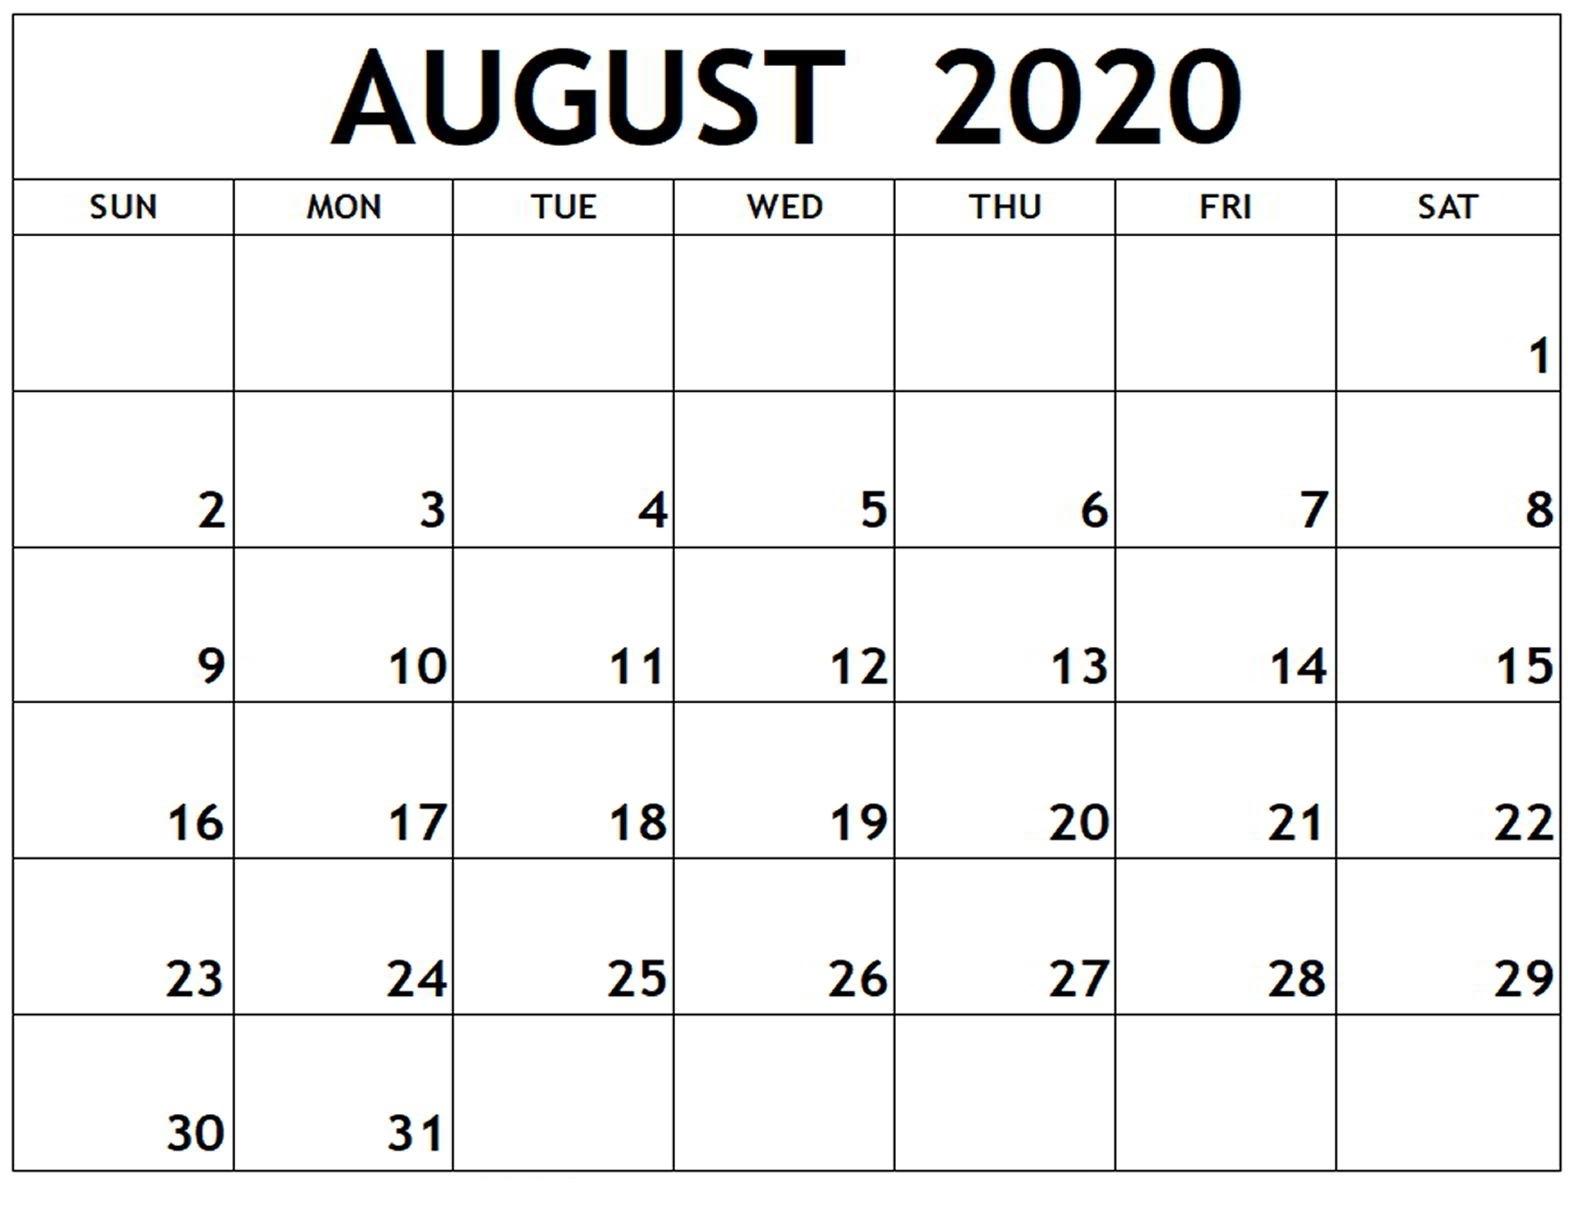 August-2020-Printable-Calendar - Web Prepration Printable Calendar August 2020 To May 2021